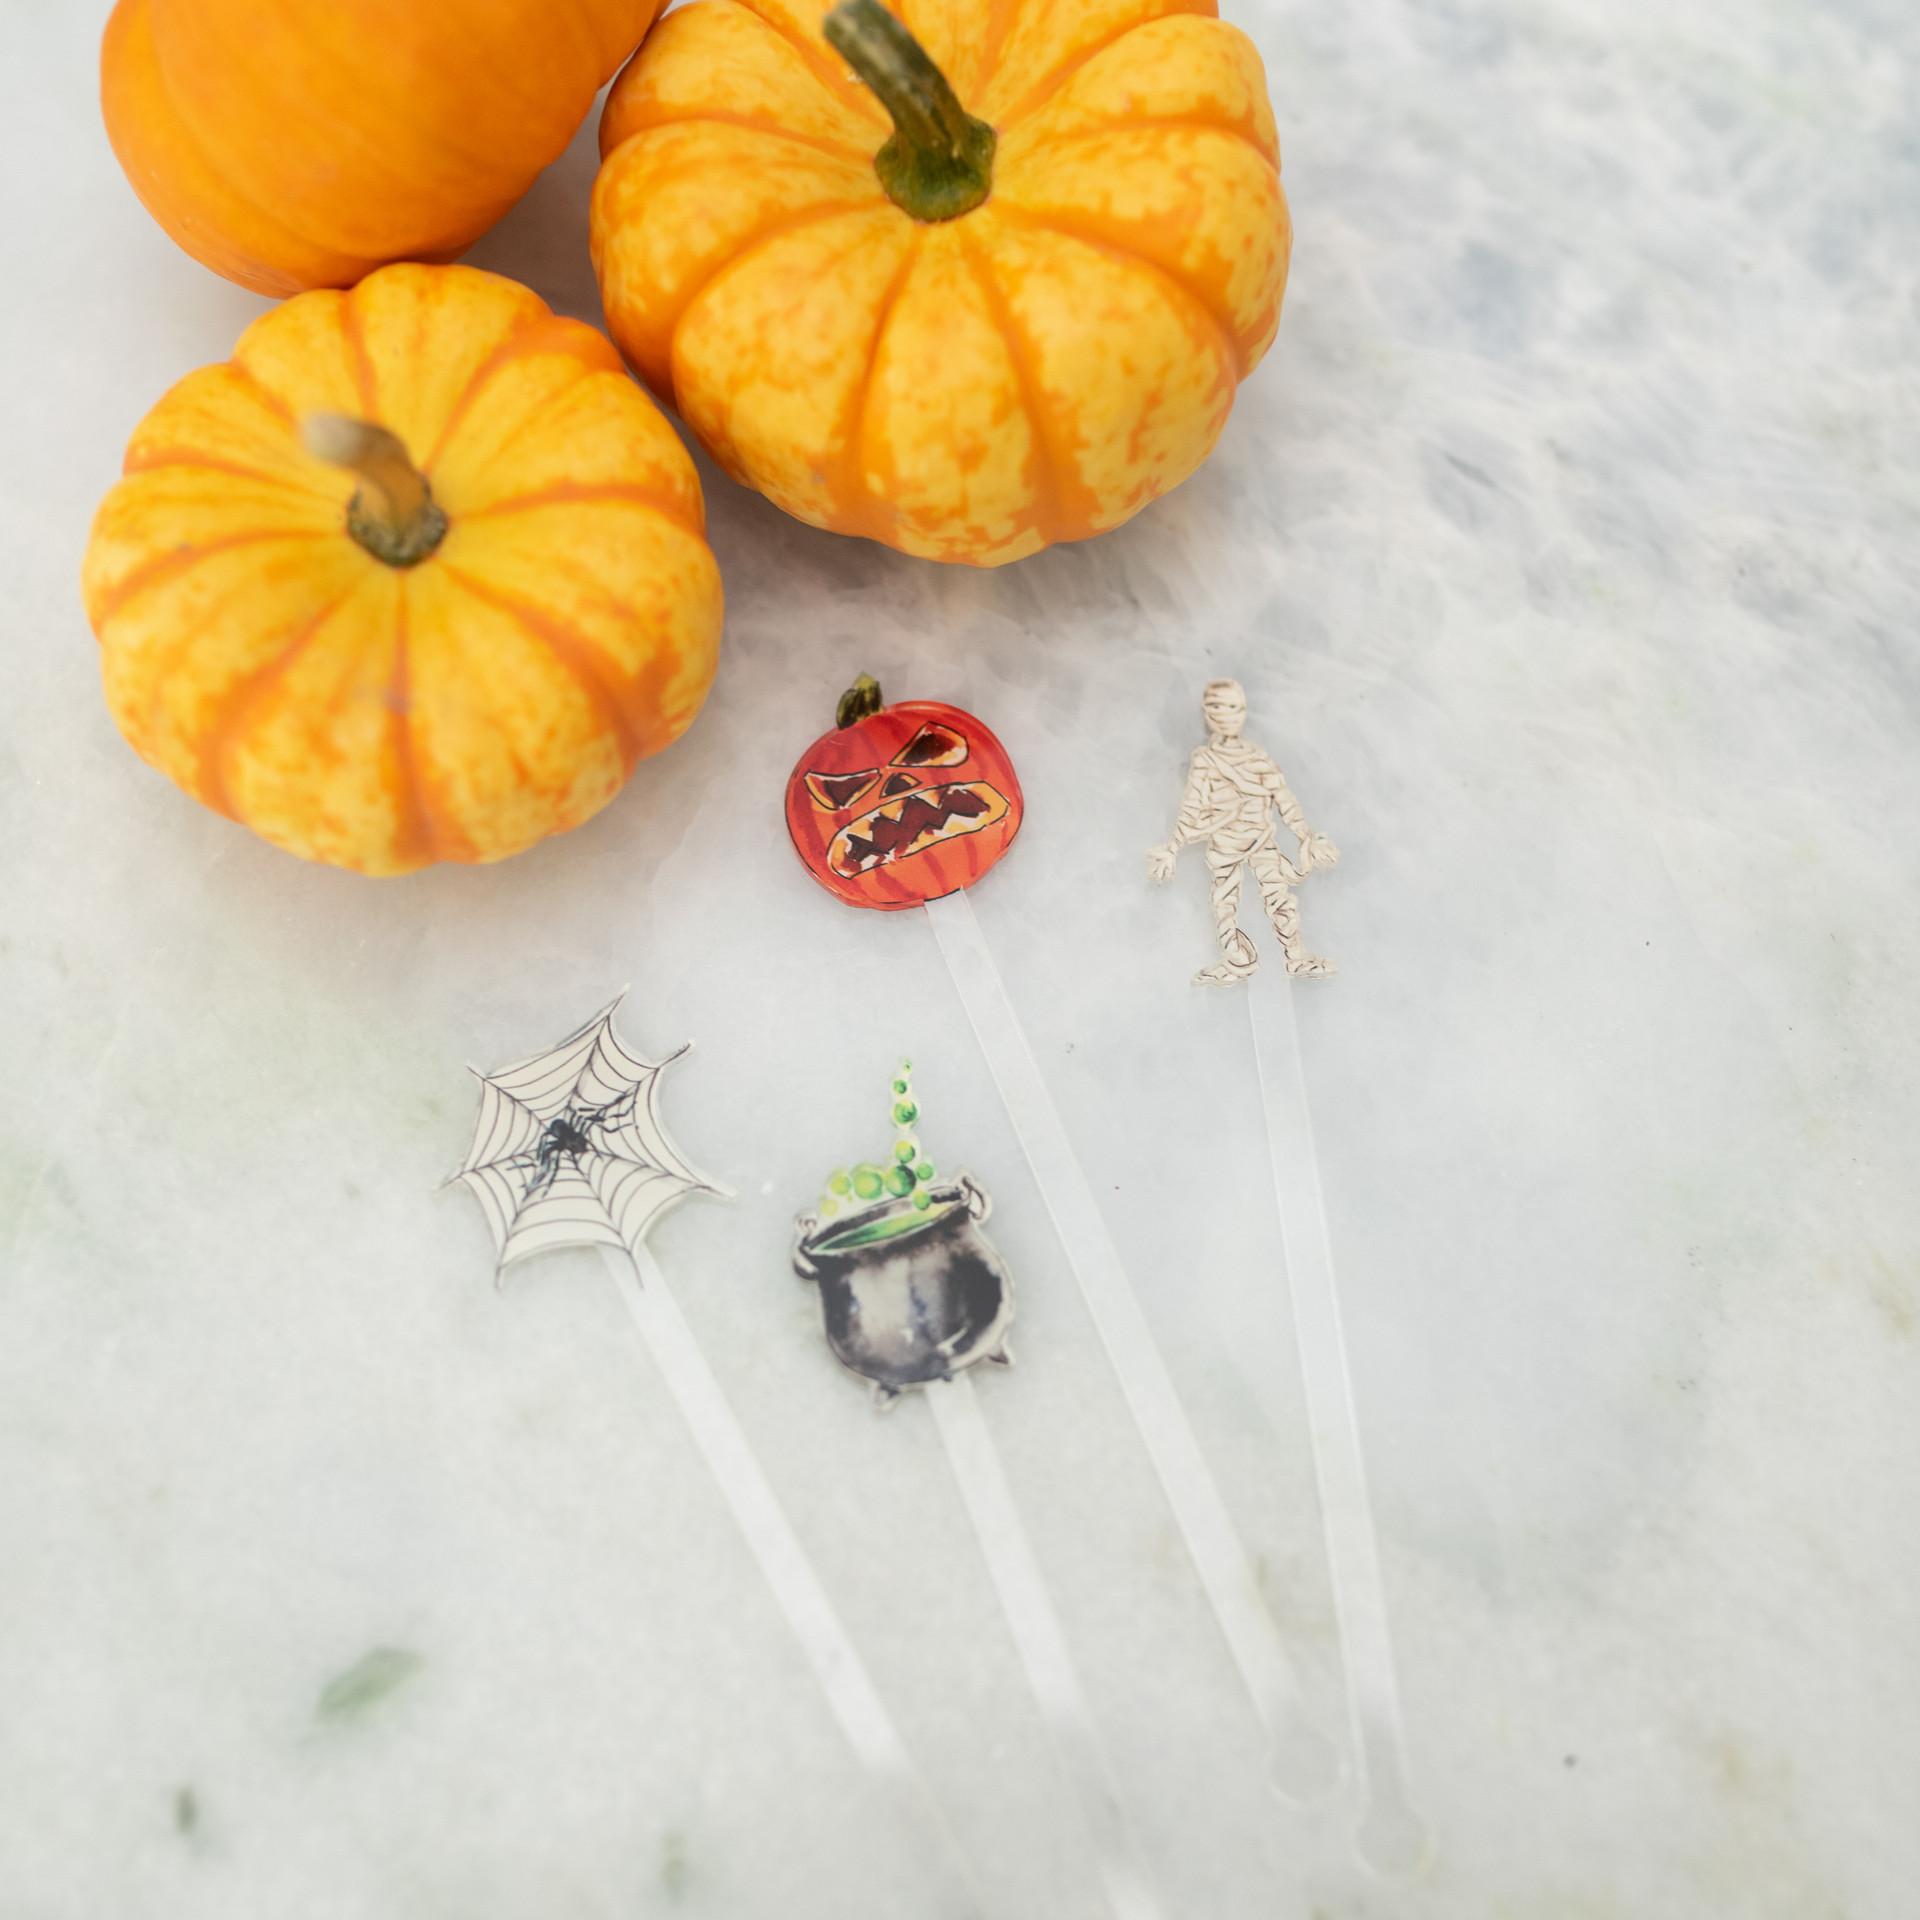 Acrylic-Sticks-Fall-2019-21.jpg